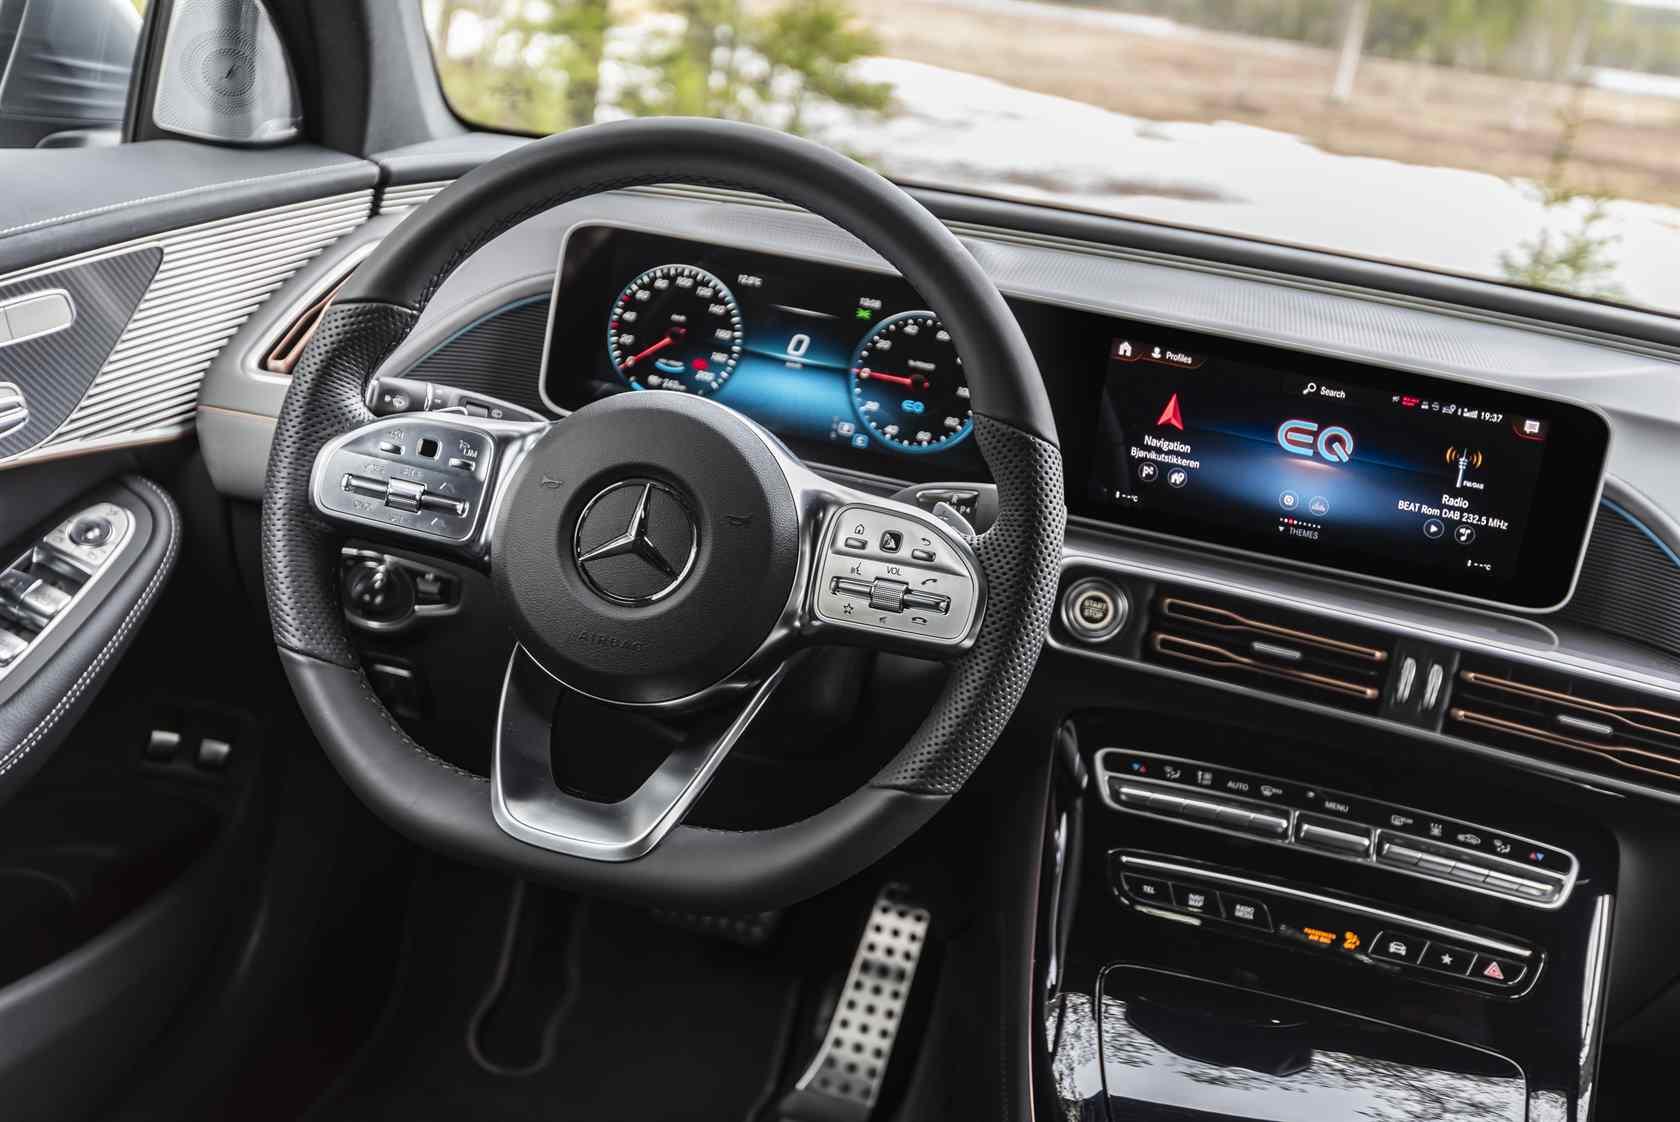 2020 Mercedes-Benz EQC SUV First Drive: Luxury EV in ...